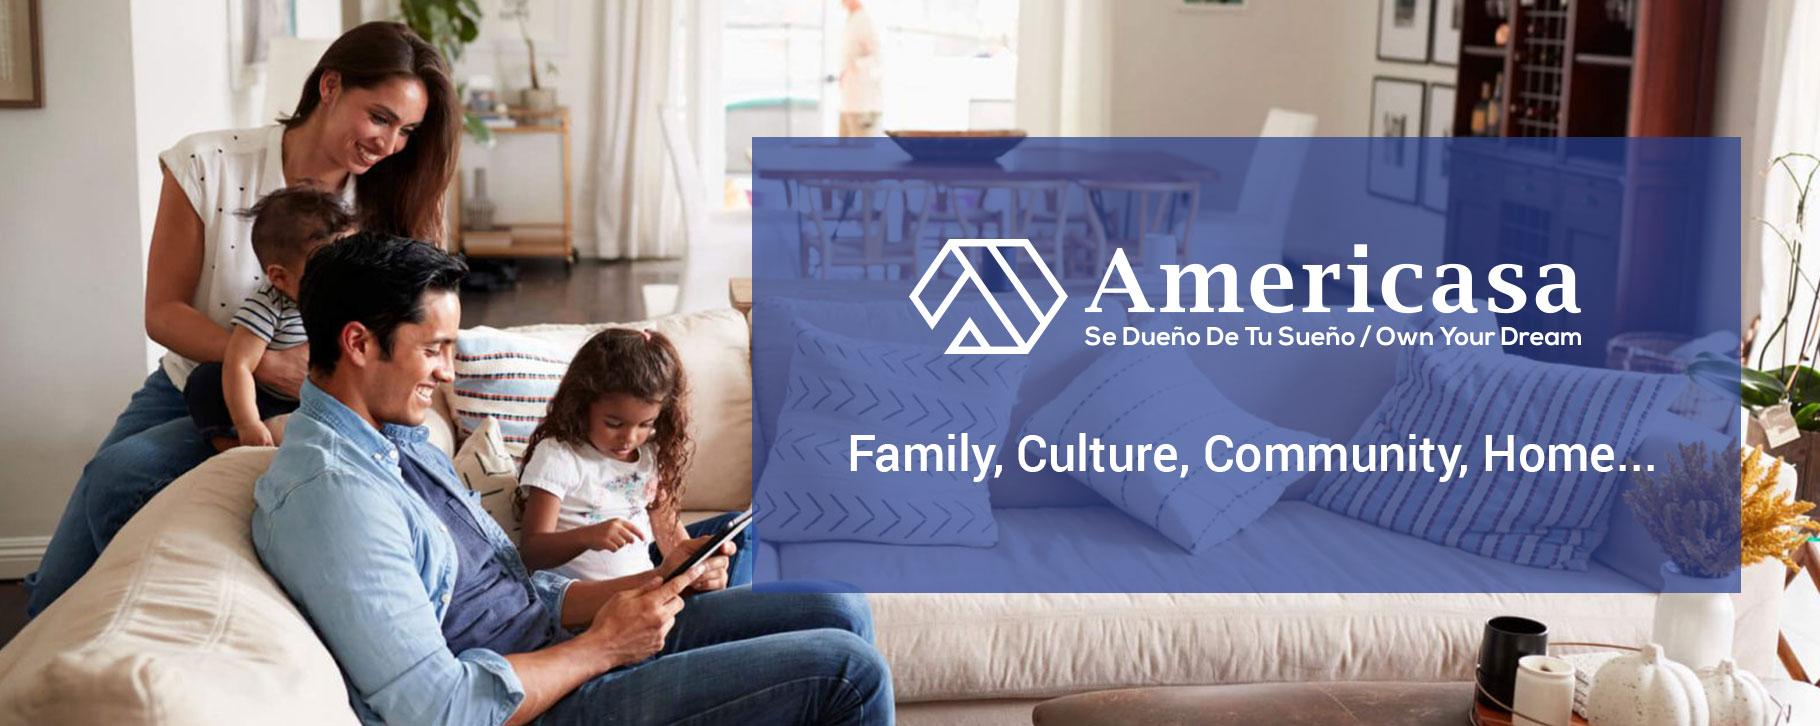 About Americasa